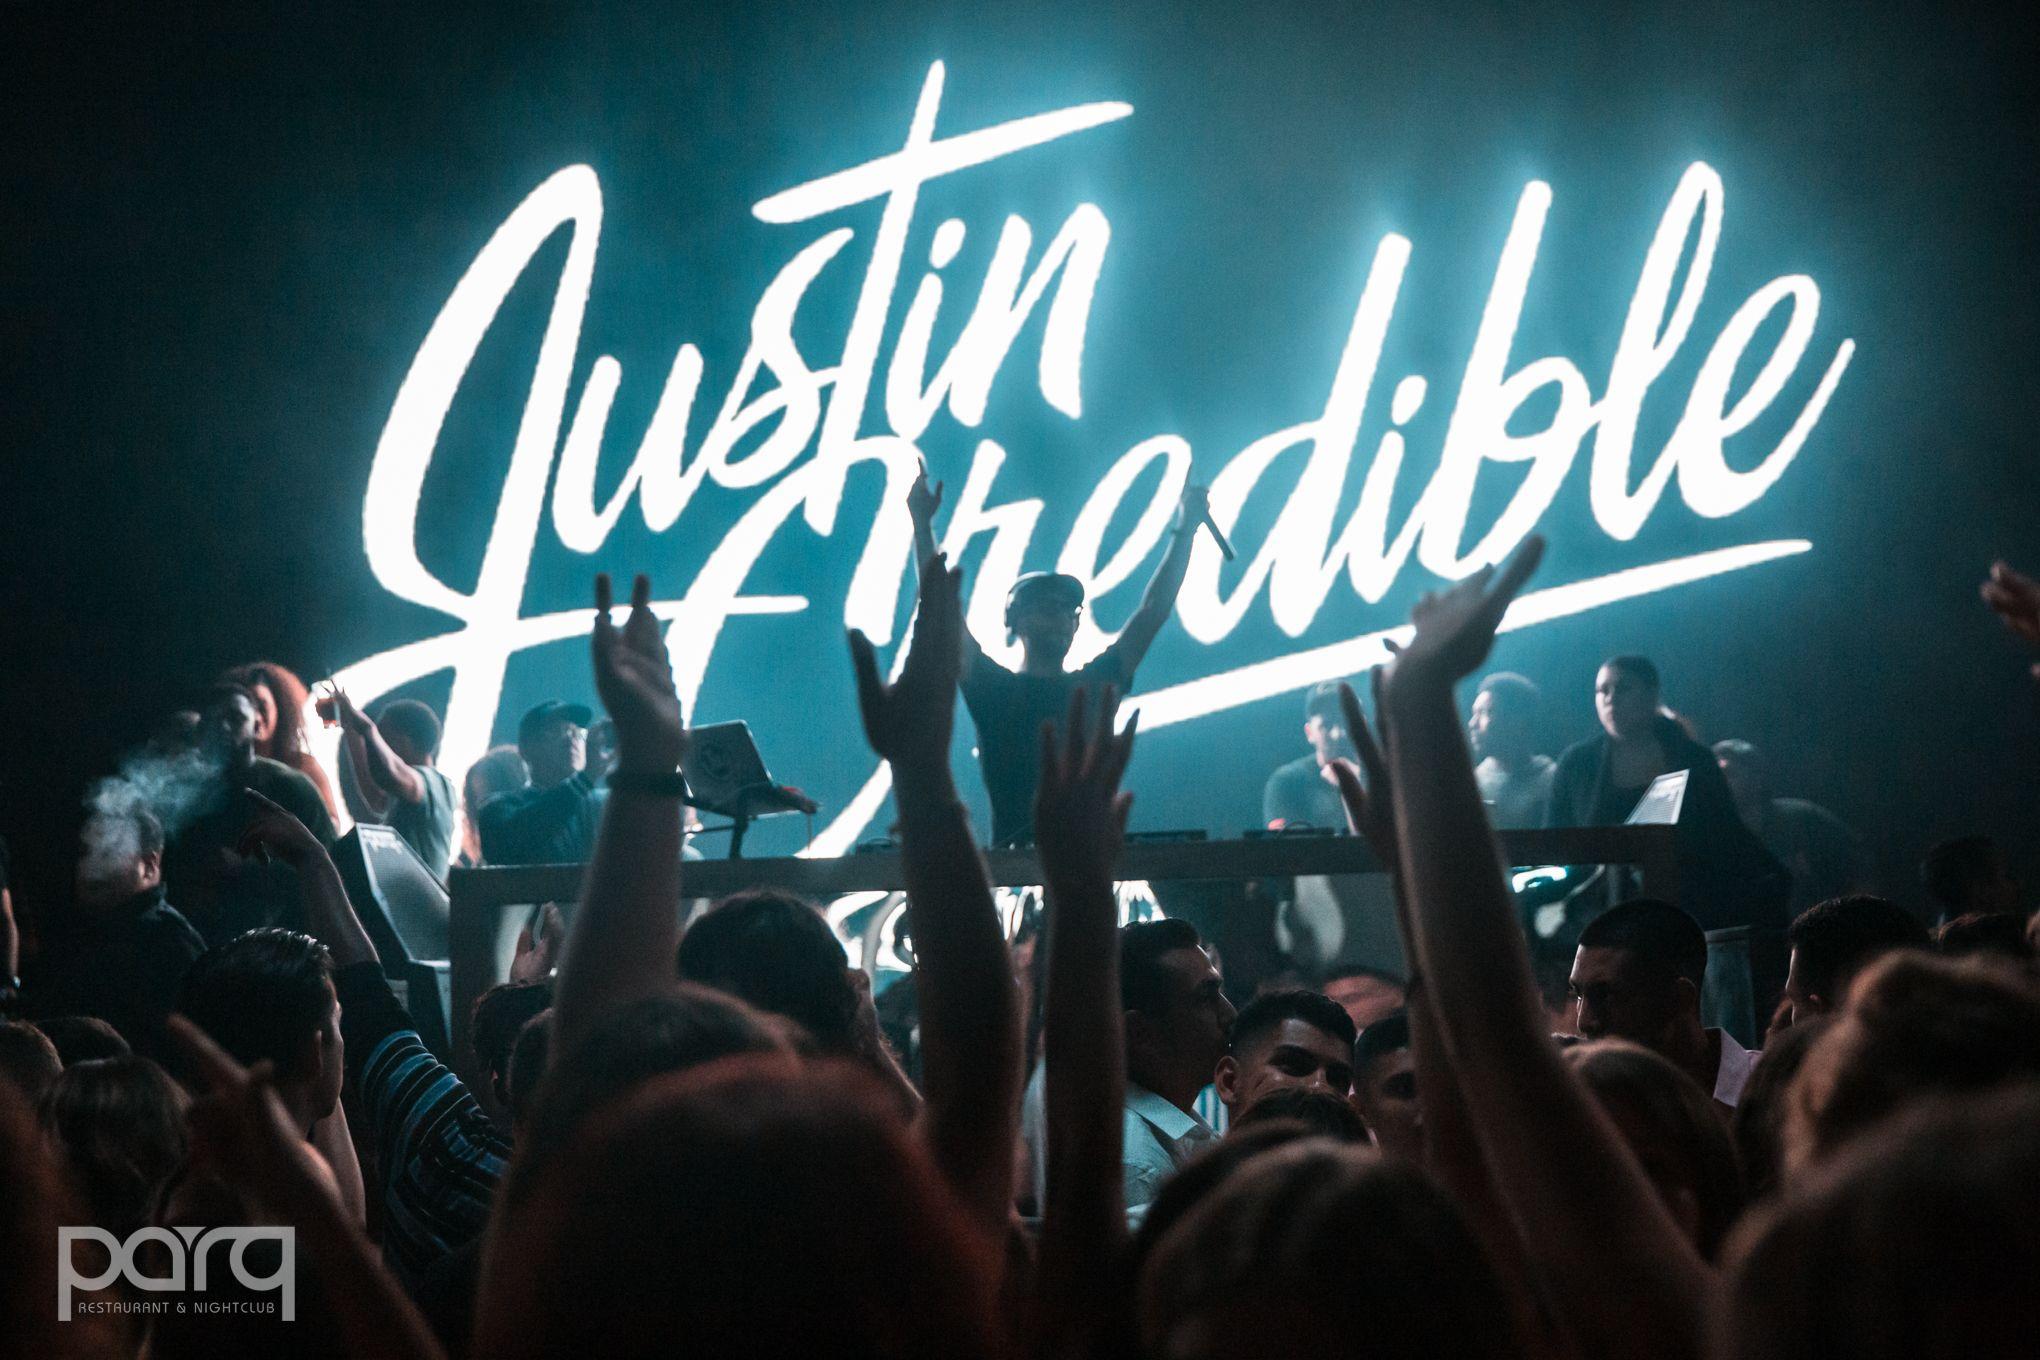 09.28.19 Parq - Justin Credible-1.jpg